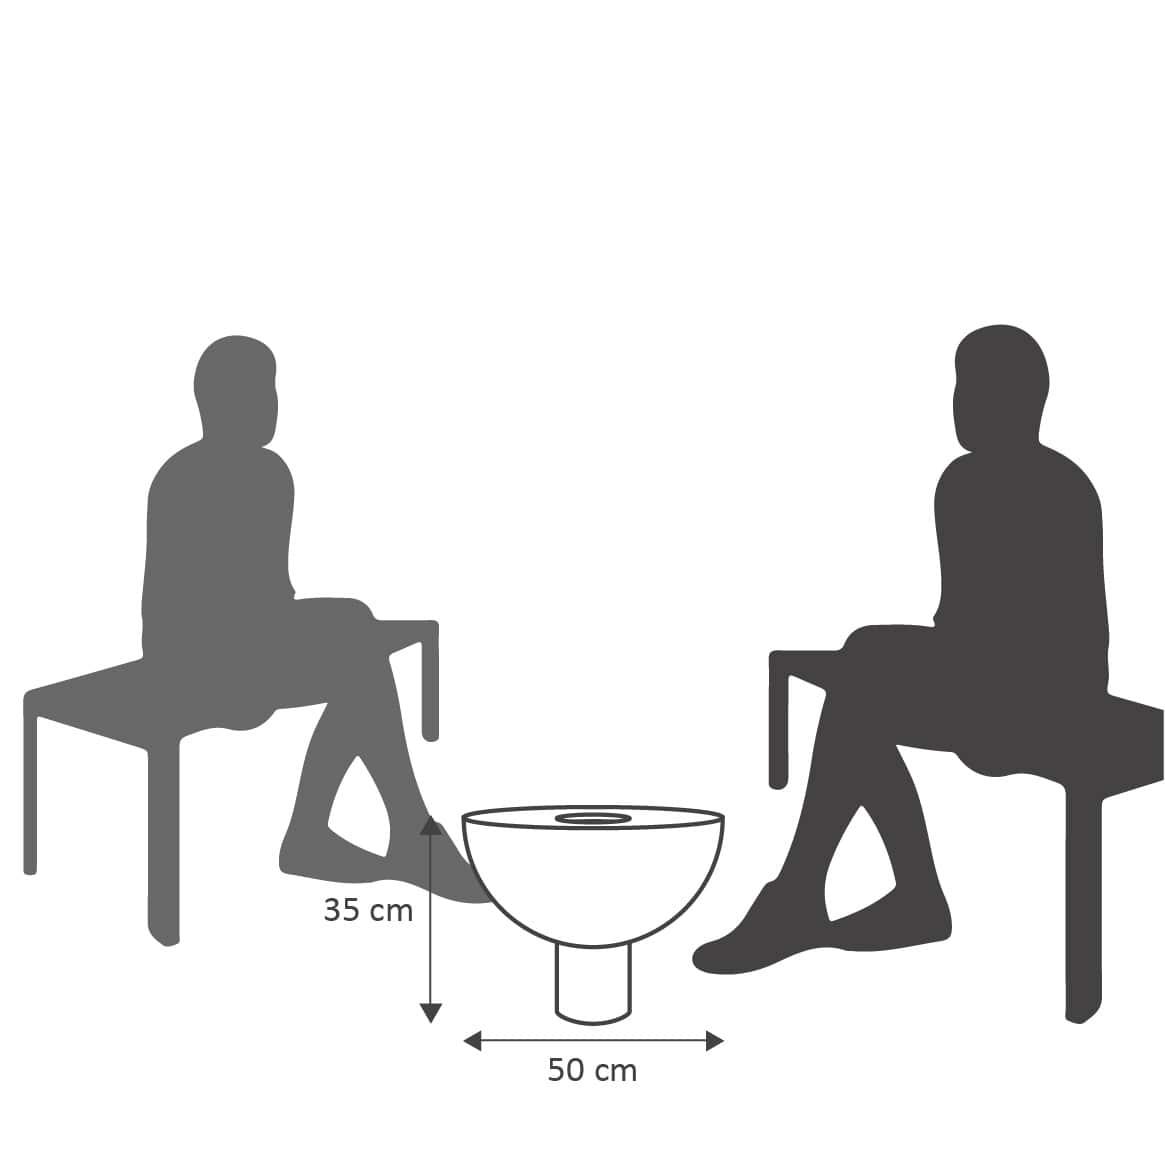 Mesa de Centro 50x35 cm com Vaso VASART